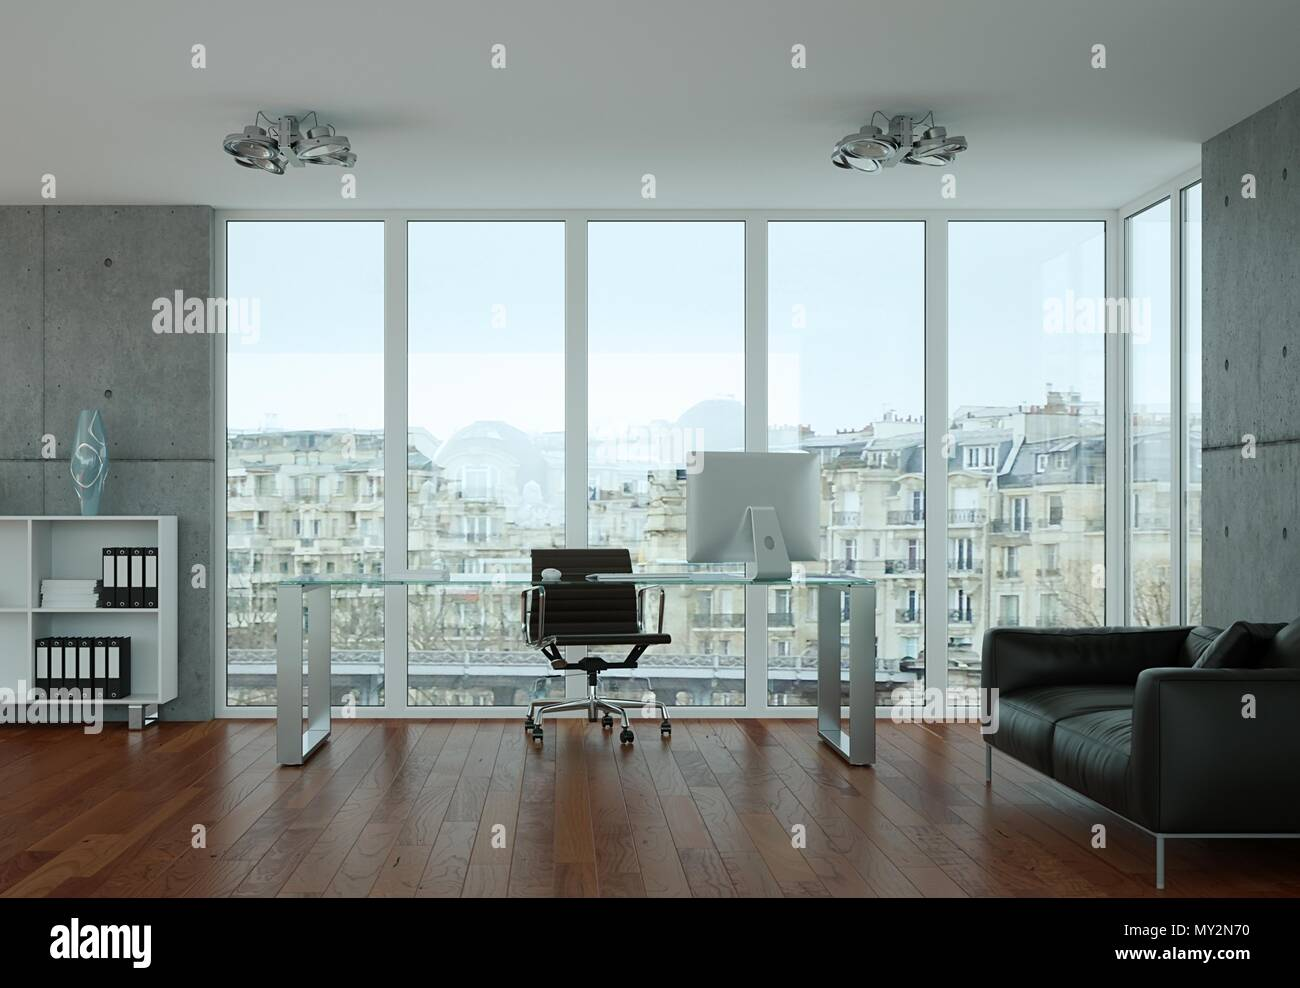 Moderne b ro innenarchitektur mit beton wand stockfoto for Modernes buro